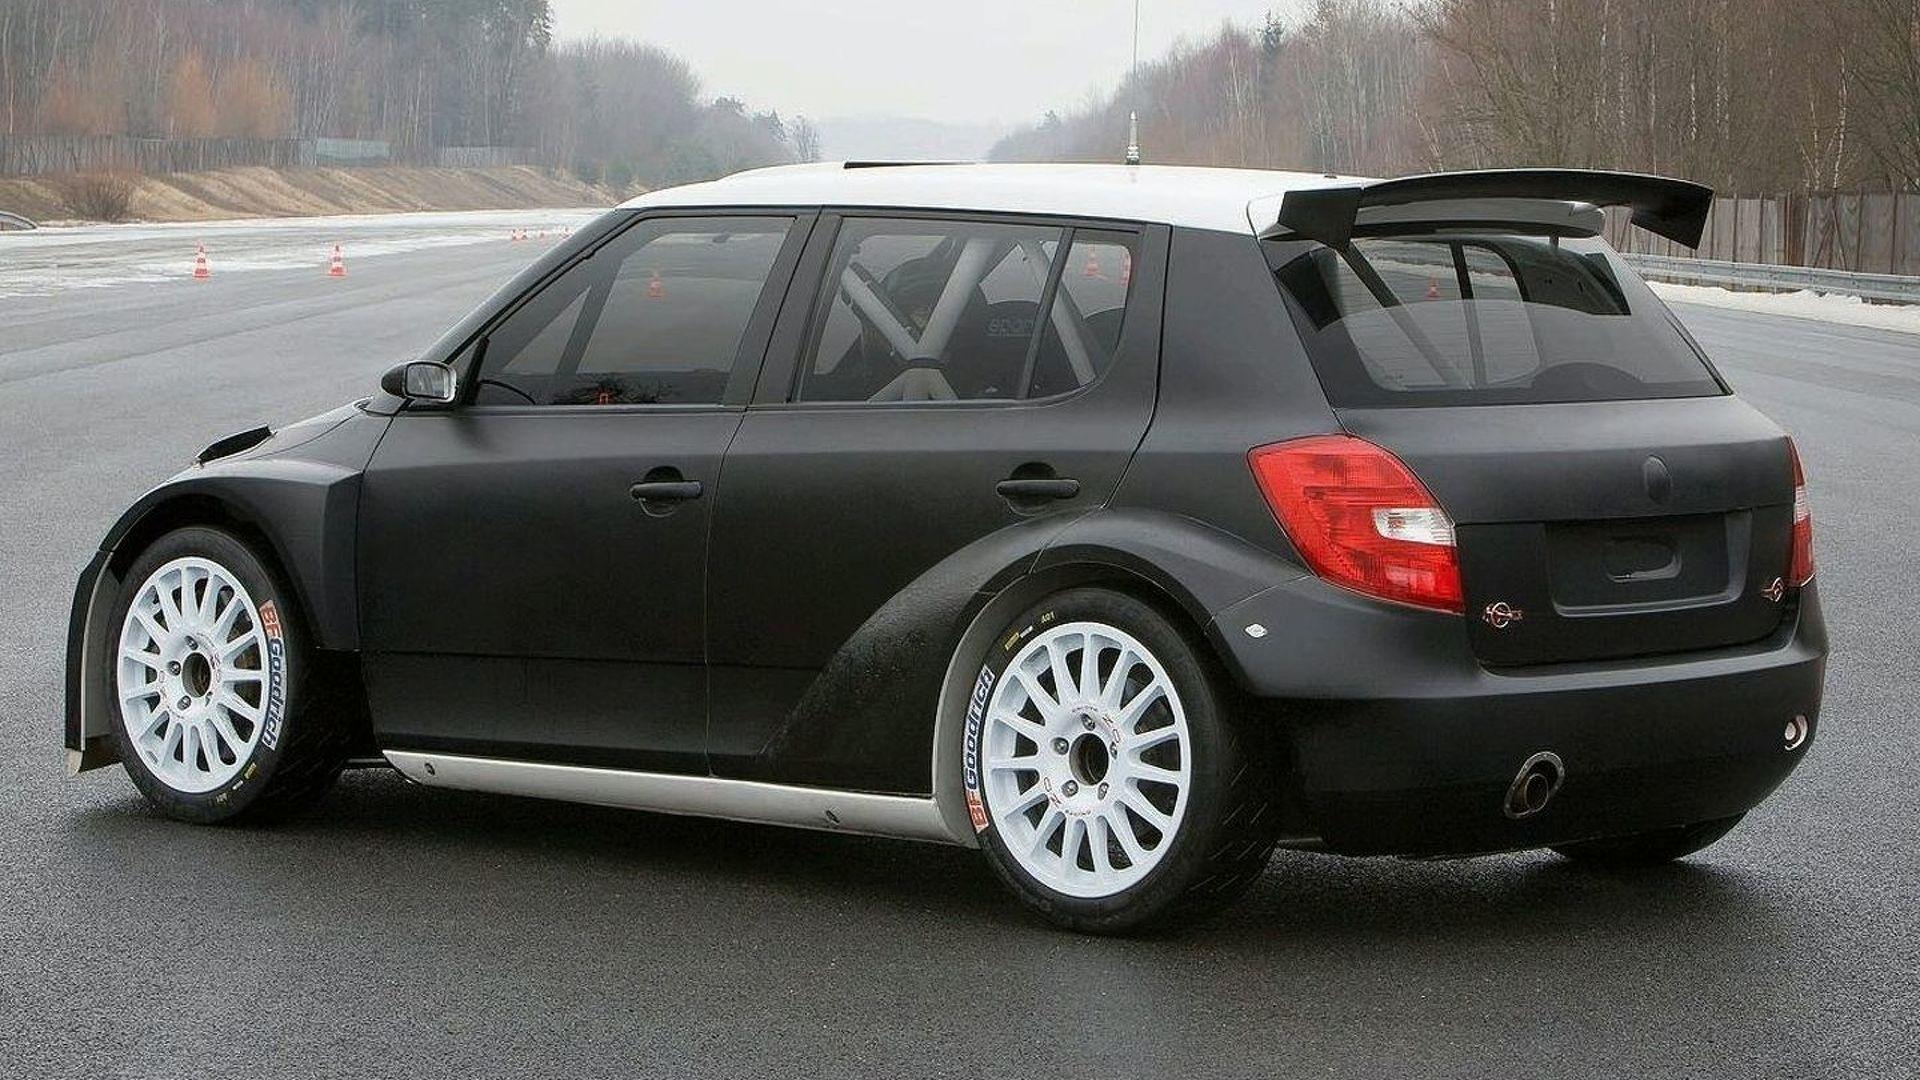 skoda fabia ii s2000 2009 racing cars. Black Bedroom Furniture Sets. Home Design Ideas